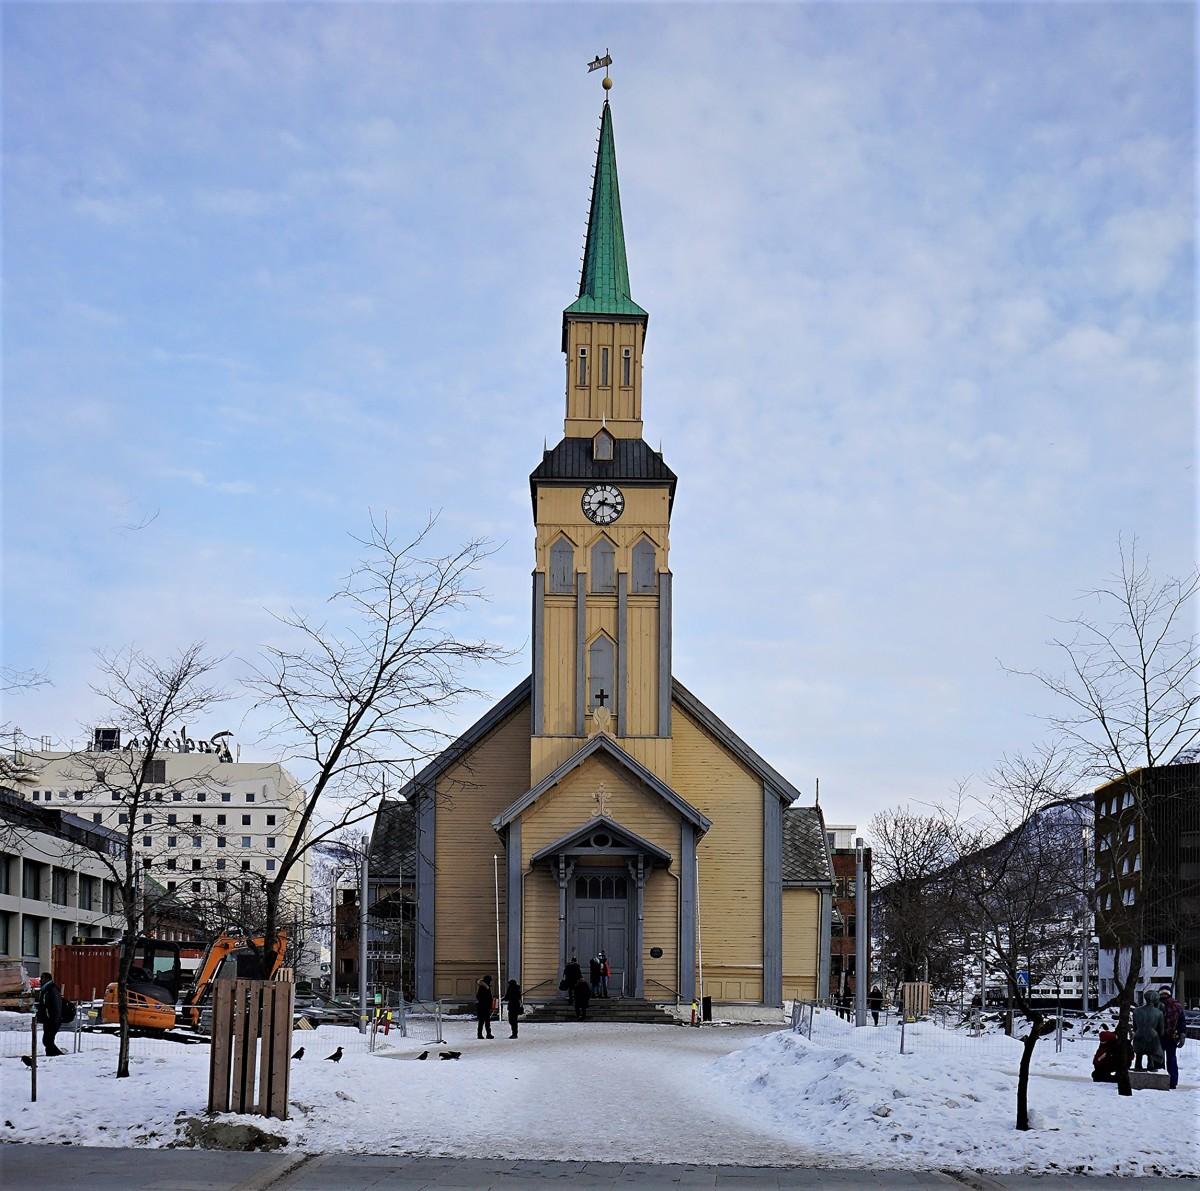 Zdjęcia: Tromsø, Troms, Katedra luterańska, NORWEGIA